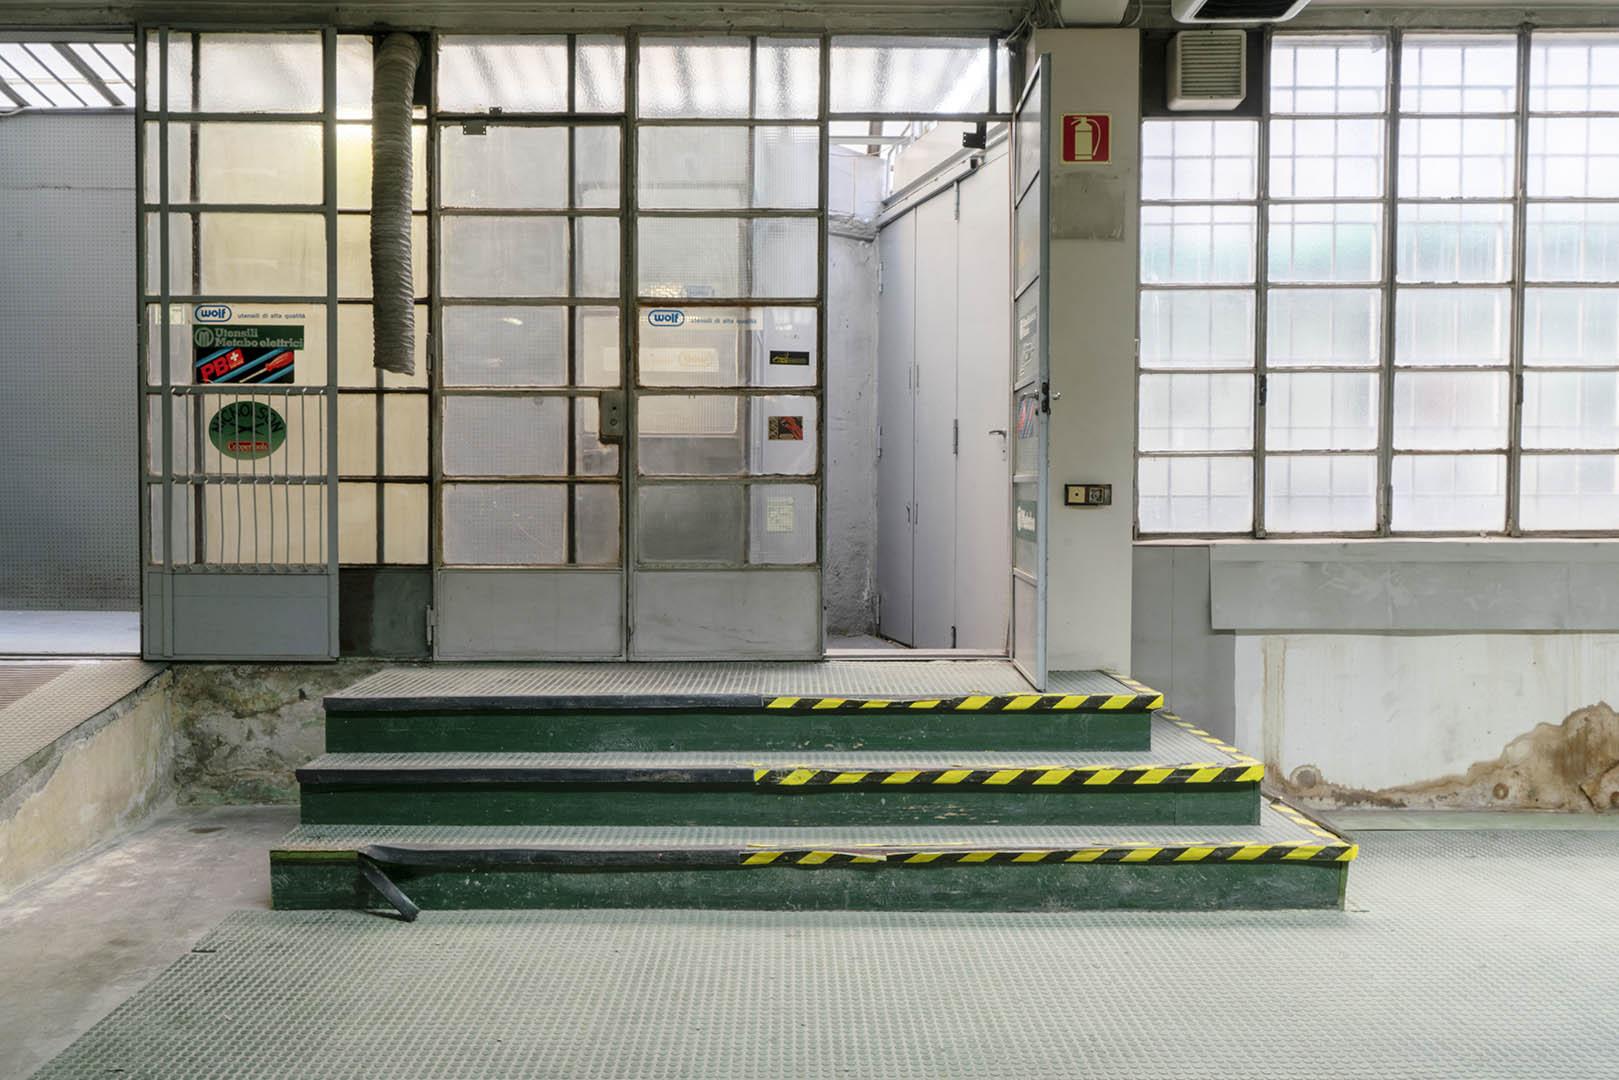 10 must-see installations at Milan Design Week: Alcova